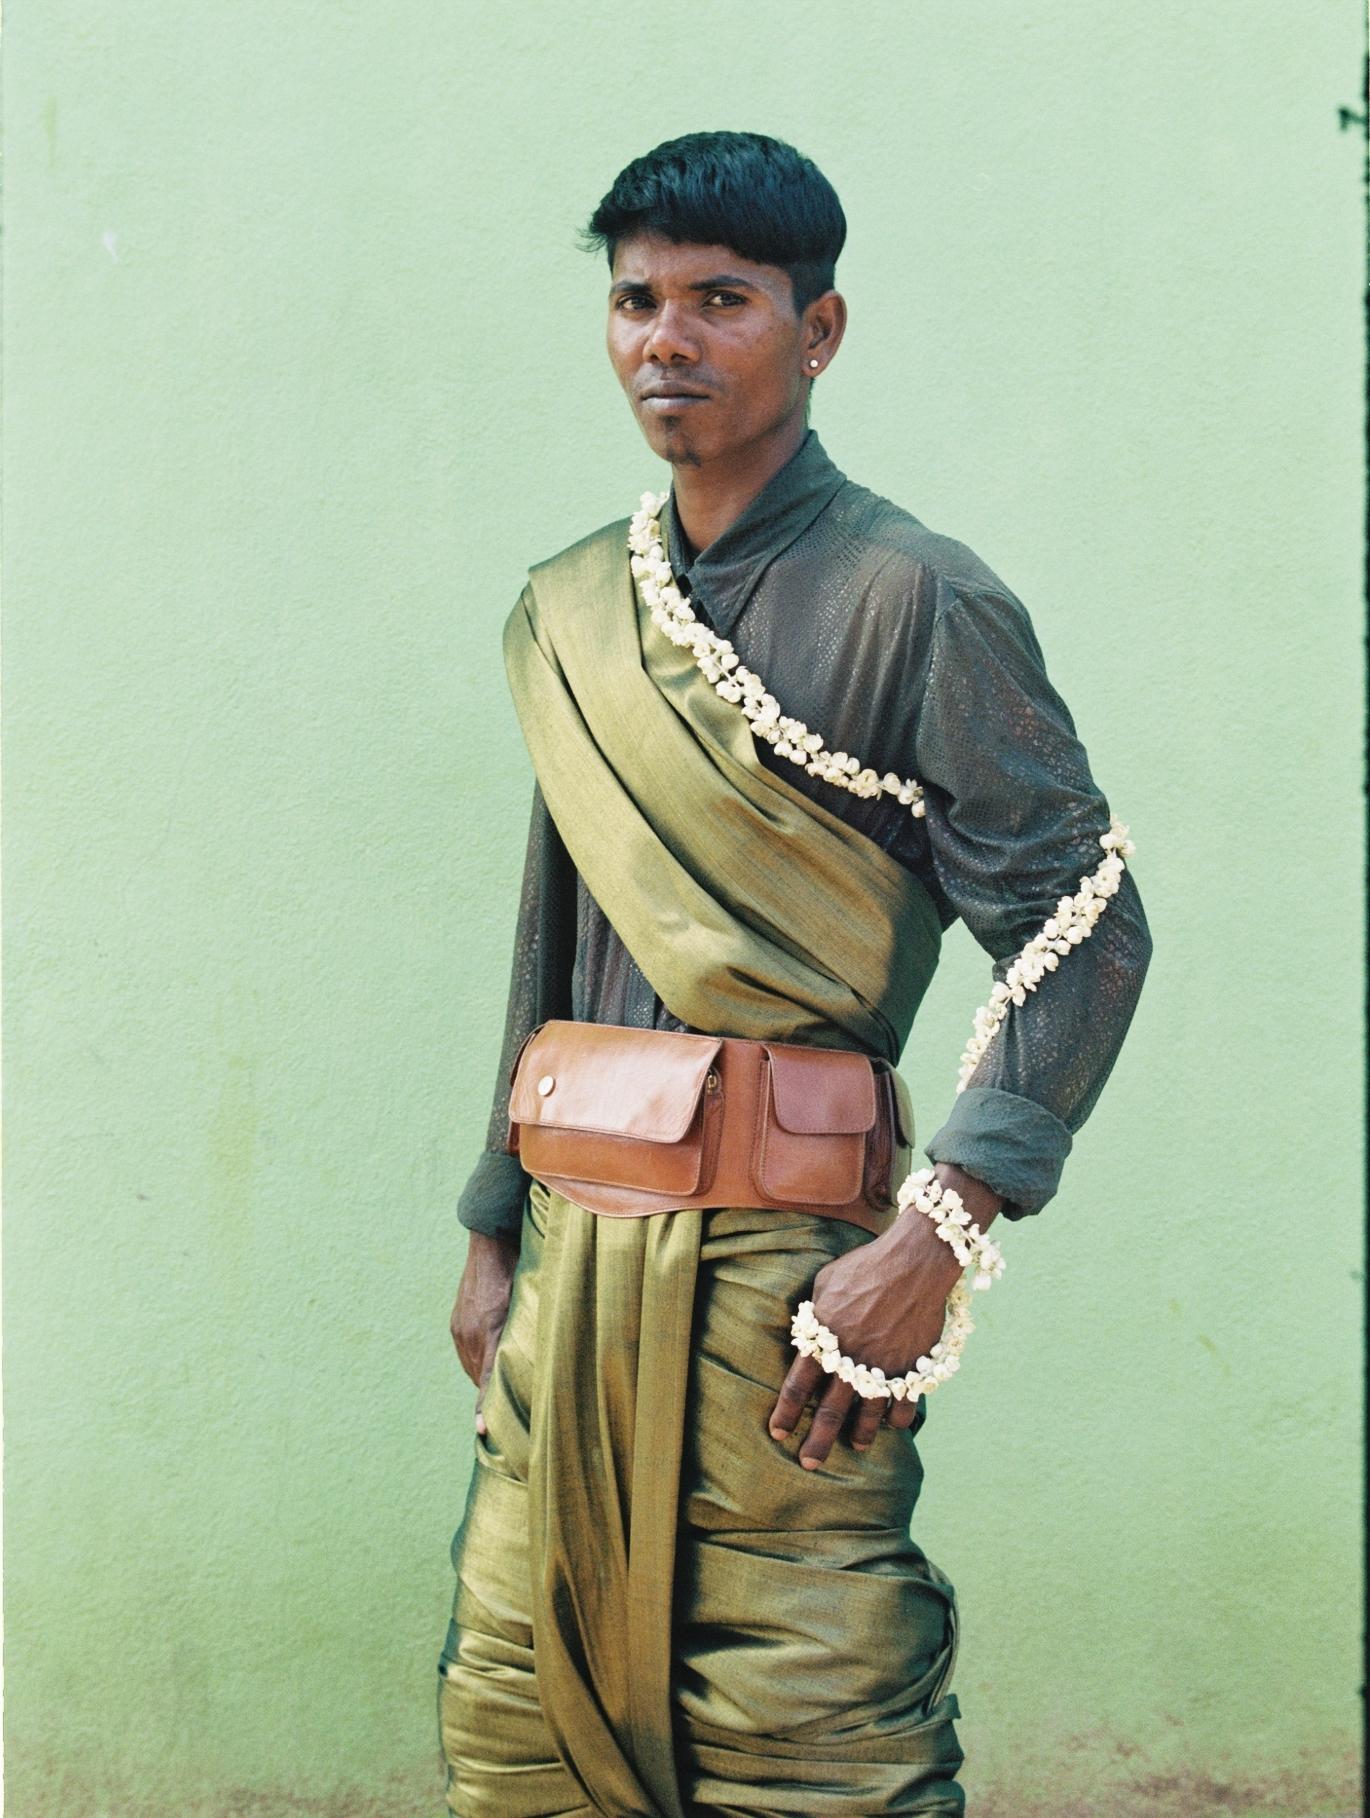 Thangaraj in our Anjuna belt bag in Toffee